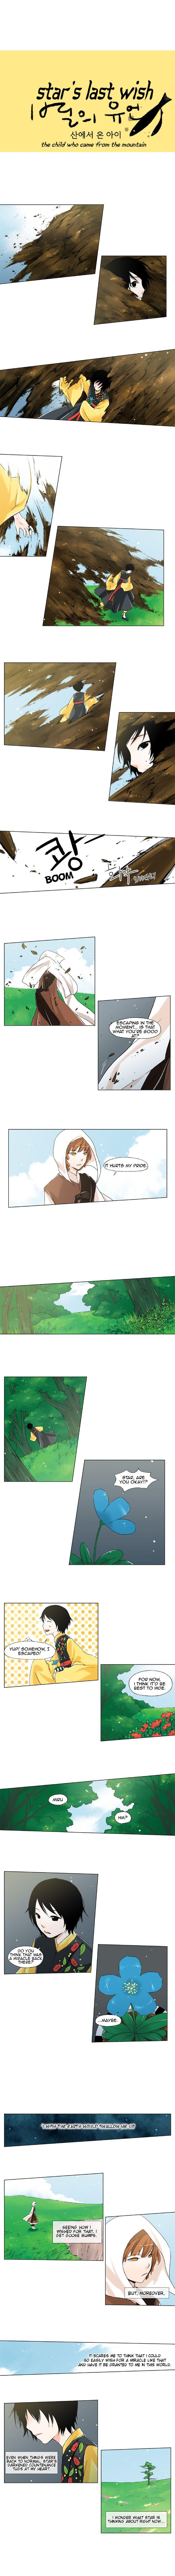 Star's Last Wish 7 Page 2